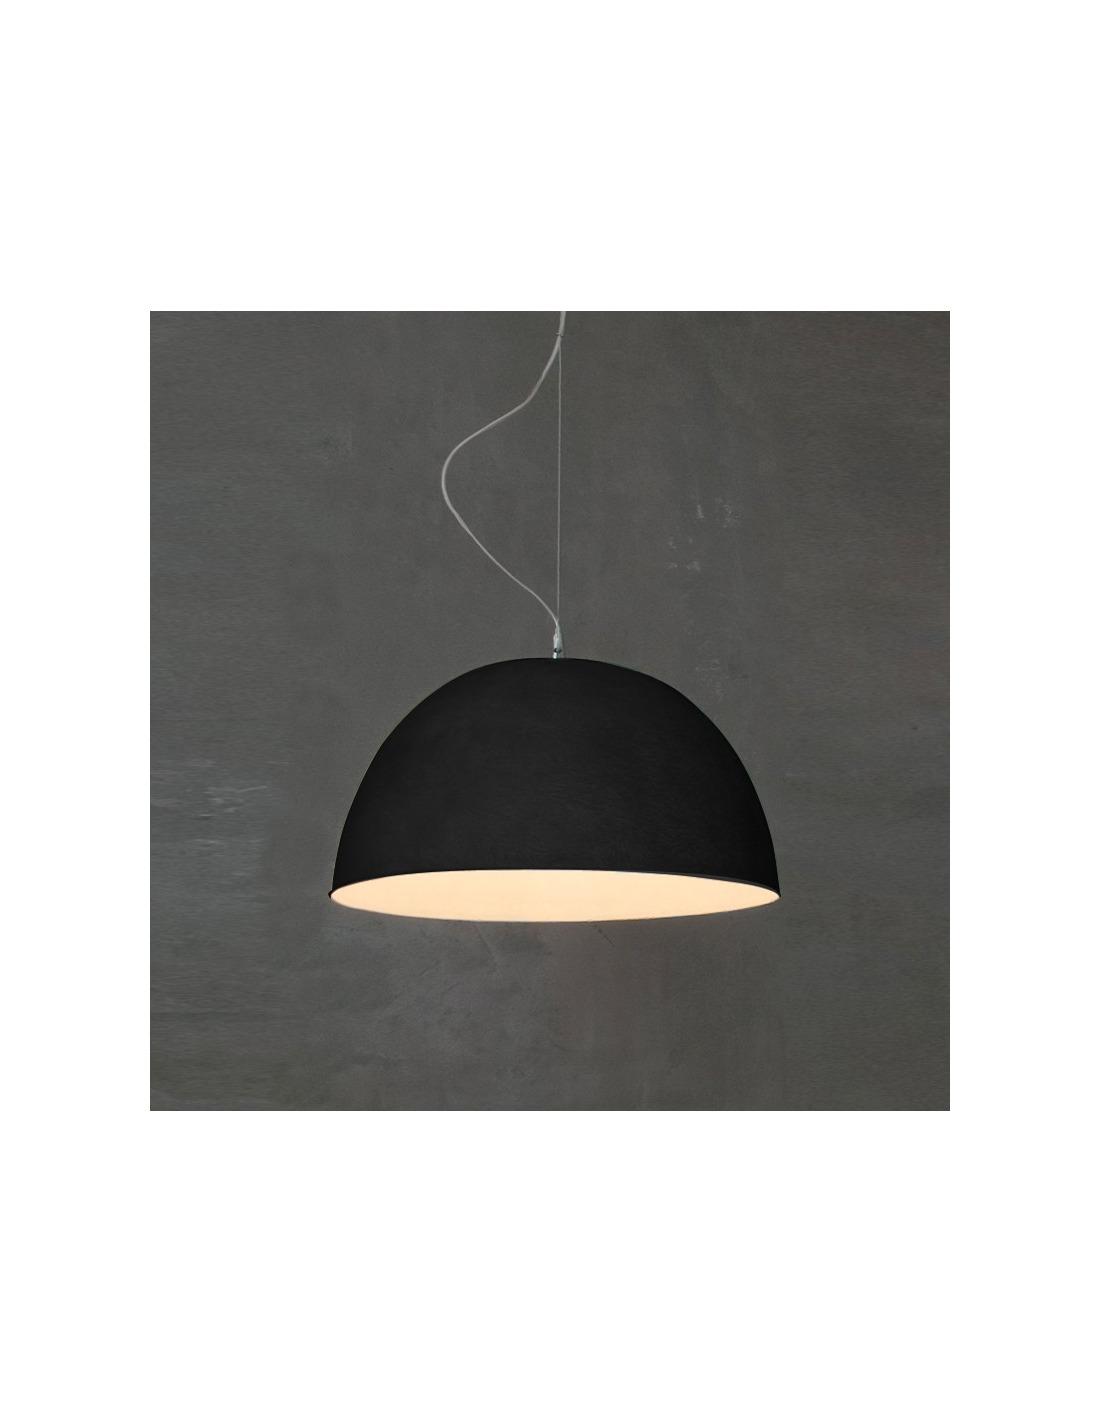 suspension contemporaine h2o noir 46cm moderne et l gante otoko. Black Bedroom Furniture Sets. Home Design Ideas